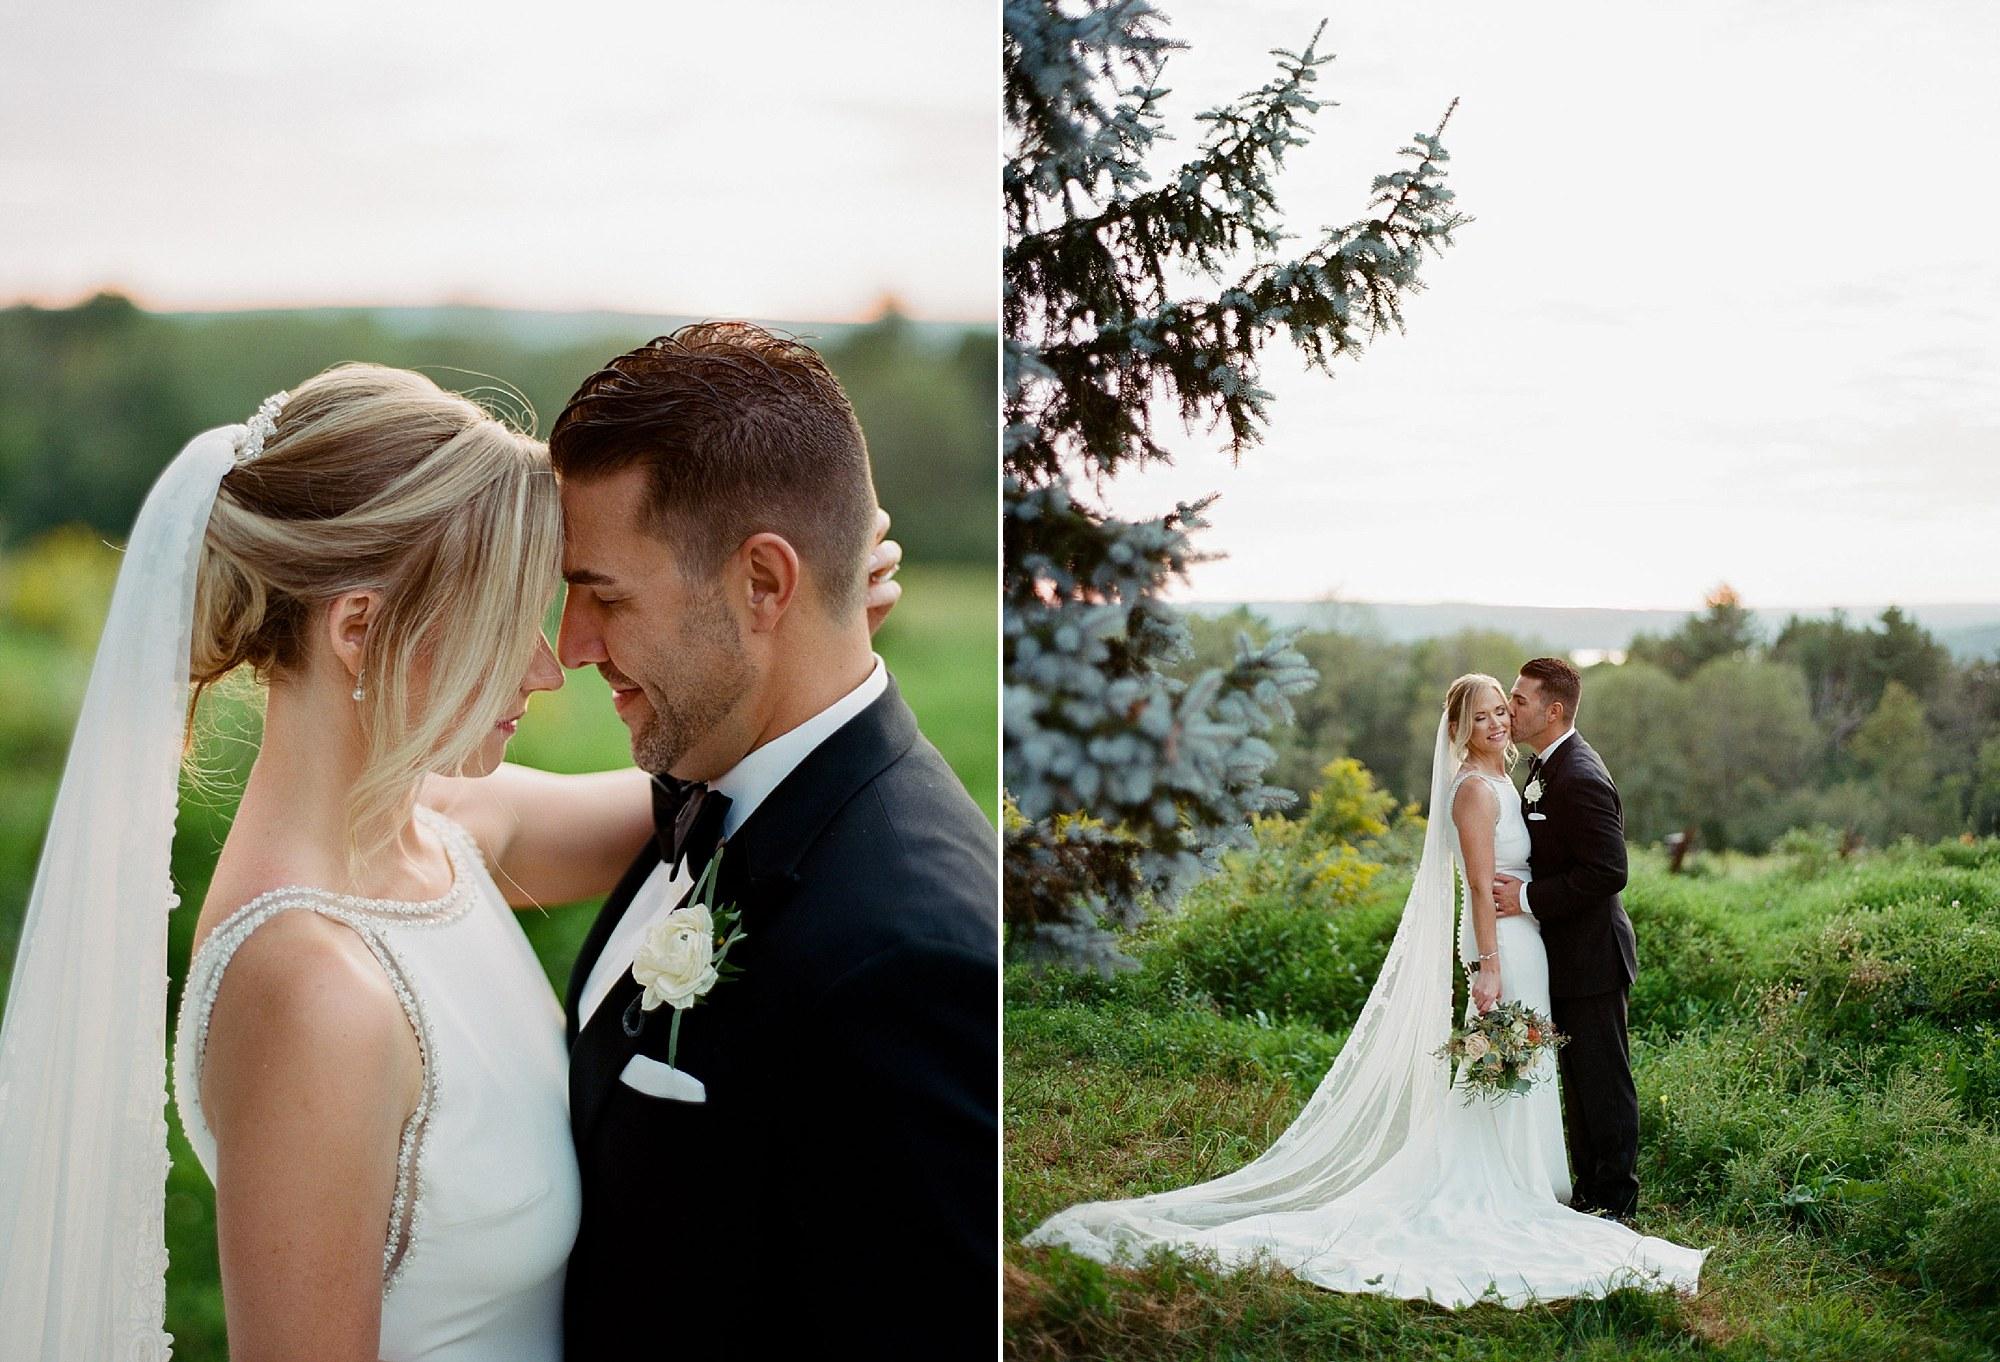 Tower hill wedding - ebersole photo-8.jpg